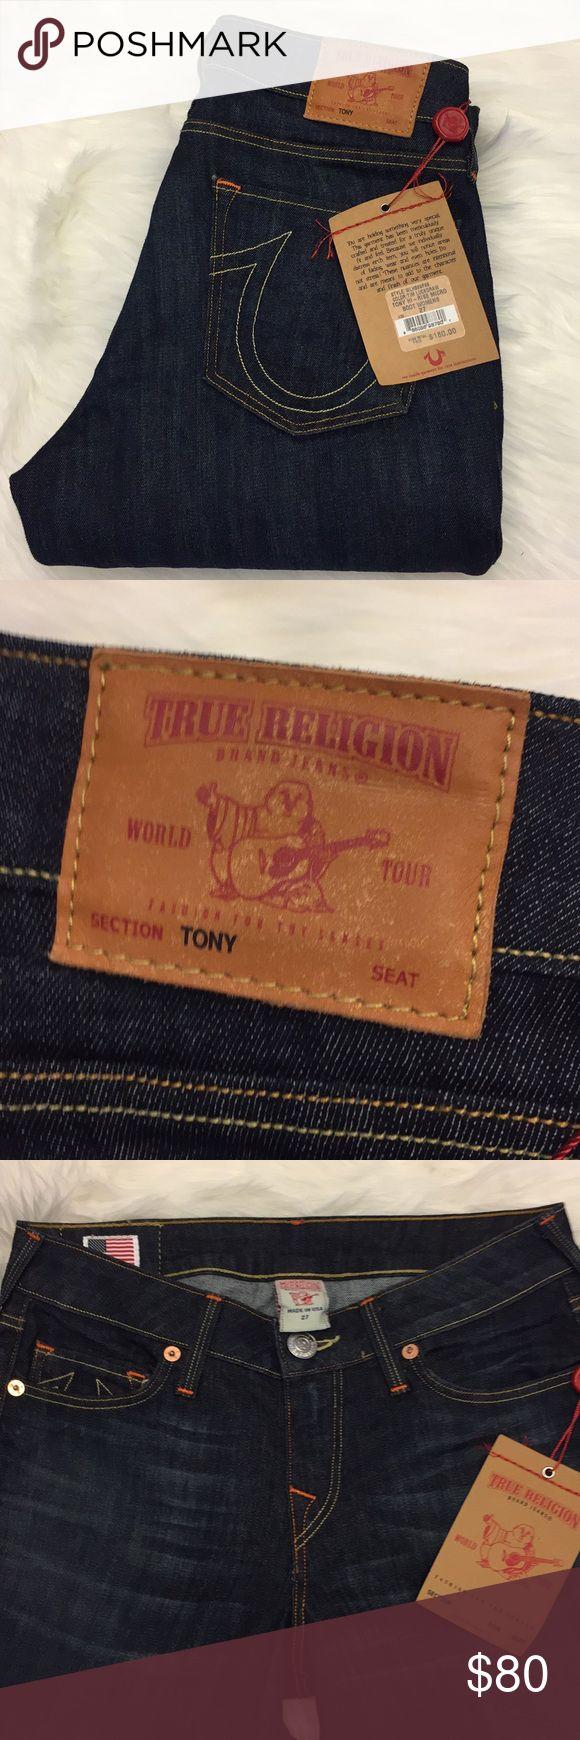 ✨NWT✨TRUE RELIGION Jeans 27 ✨NWT✨TRUE RELIGION Jeans 27 True Religion Jeans Boot Cut